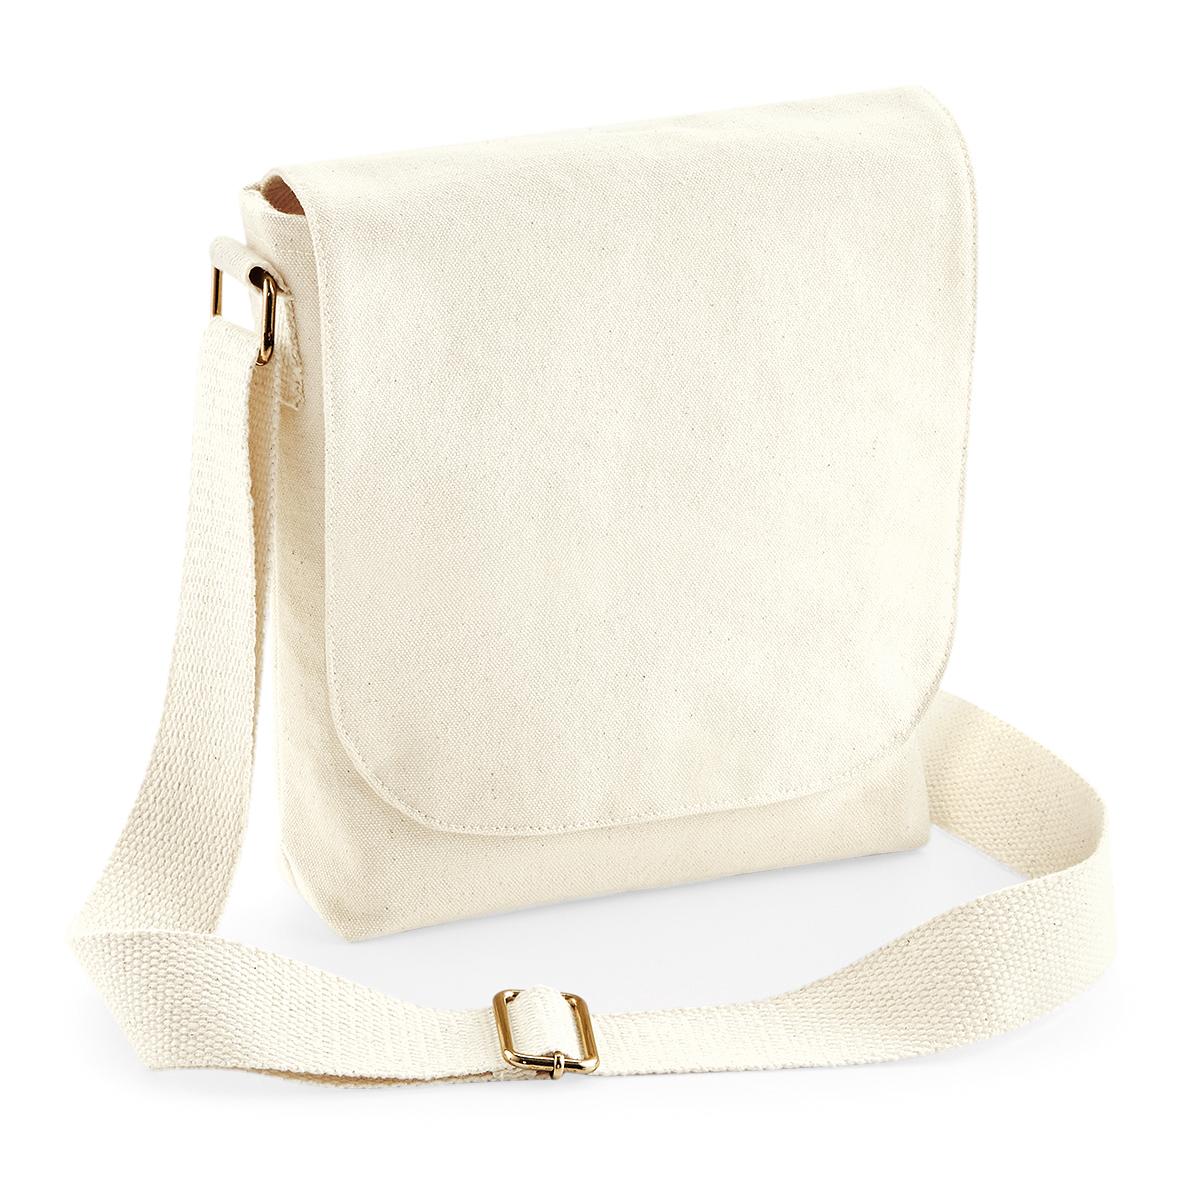 WM460 - Fairtrade Cotton Canvas Mini Messenger